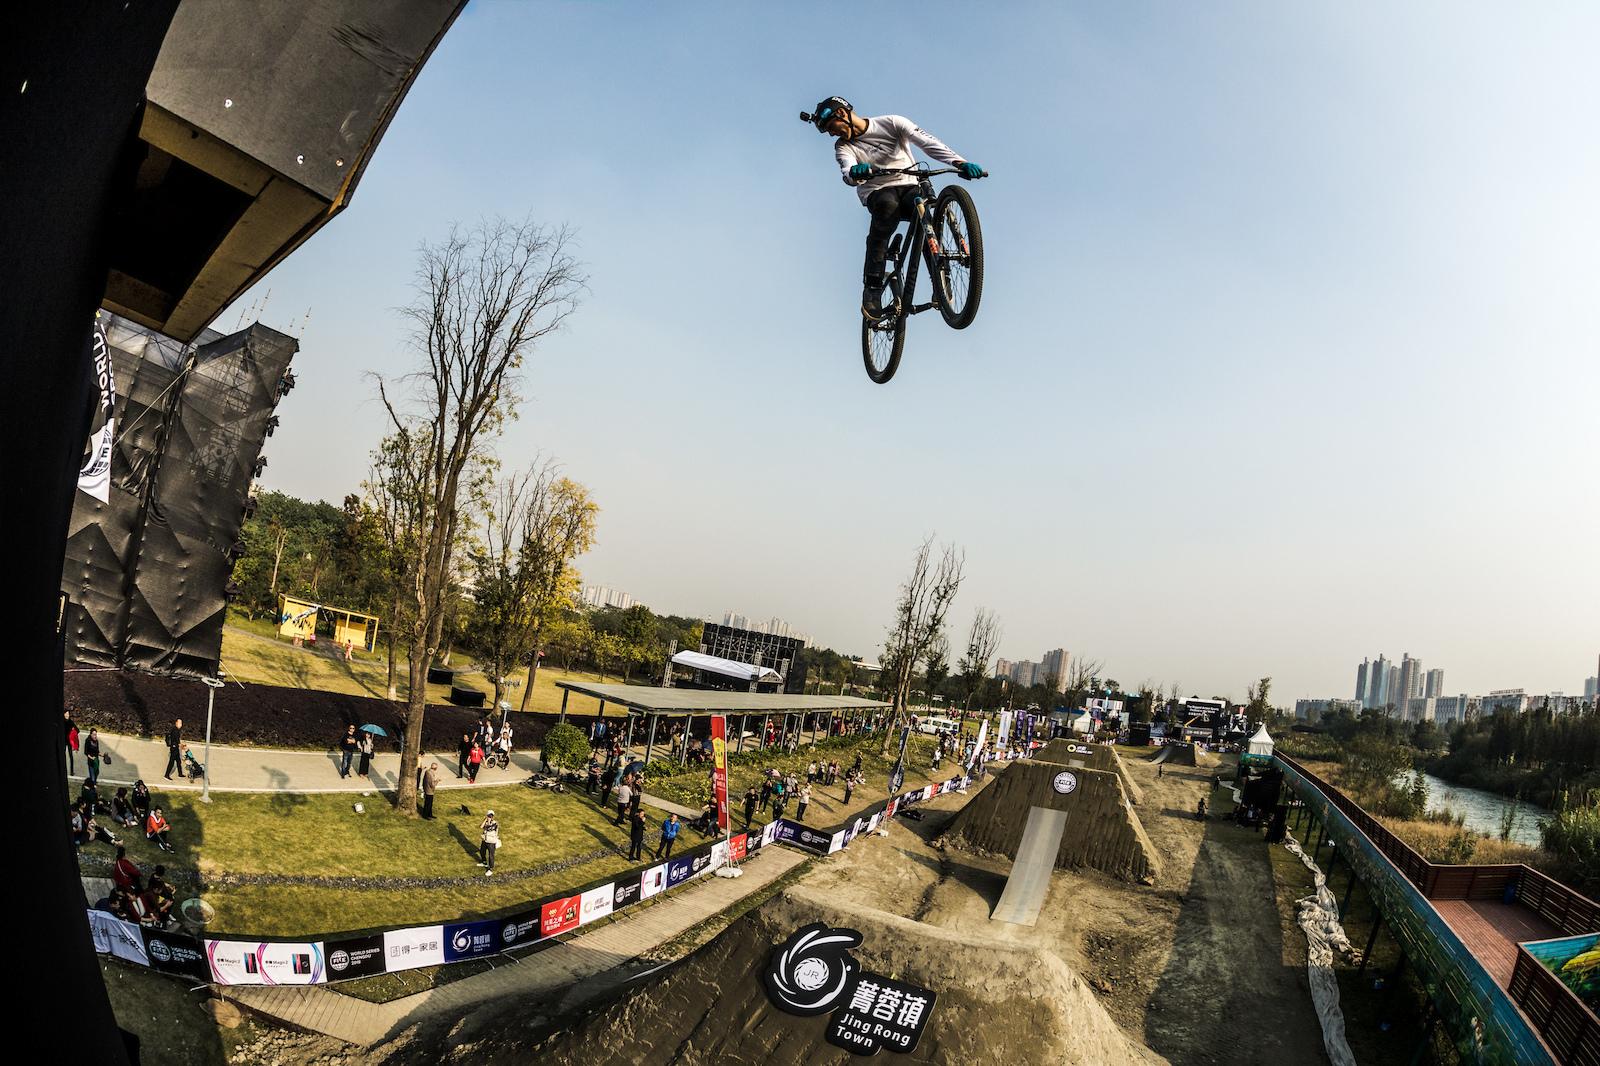 Lukas Knoph spots his landing.